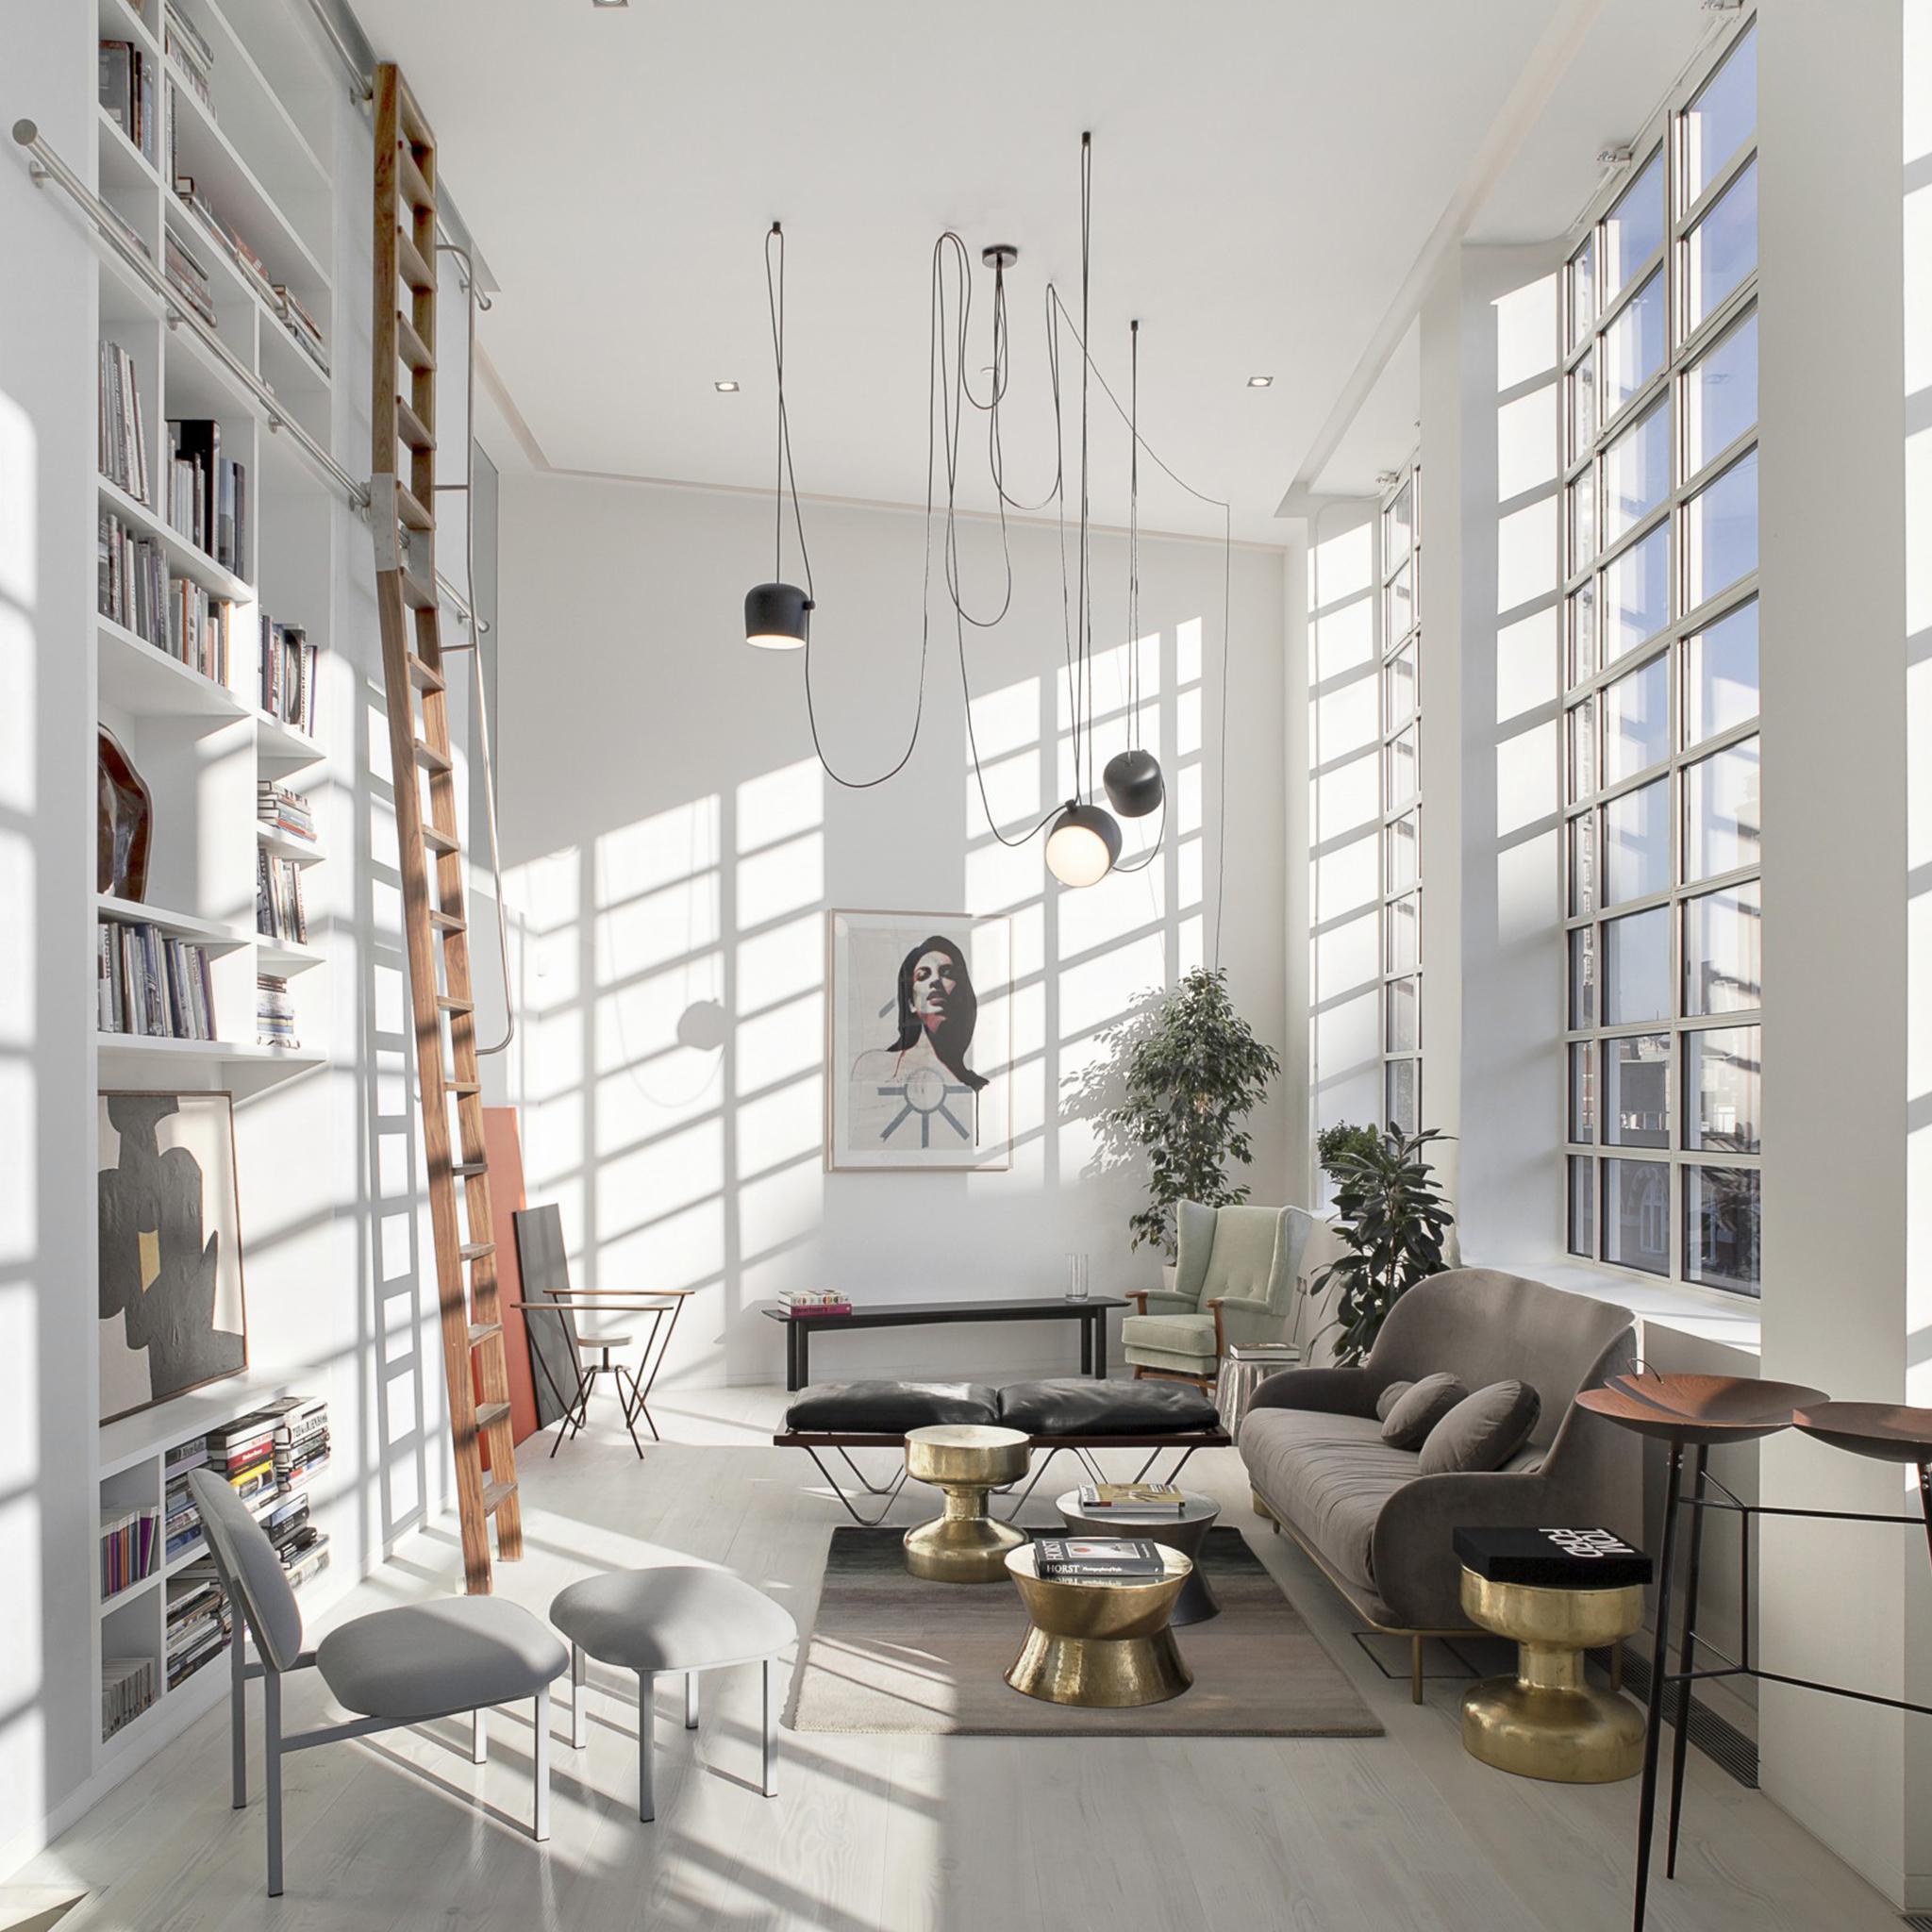 saint-martins-lofts-interior-sitting-room.jpg